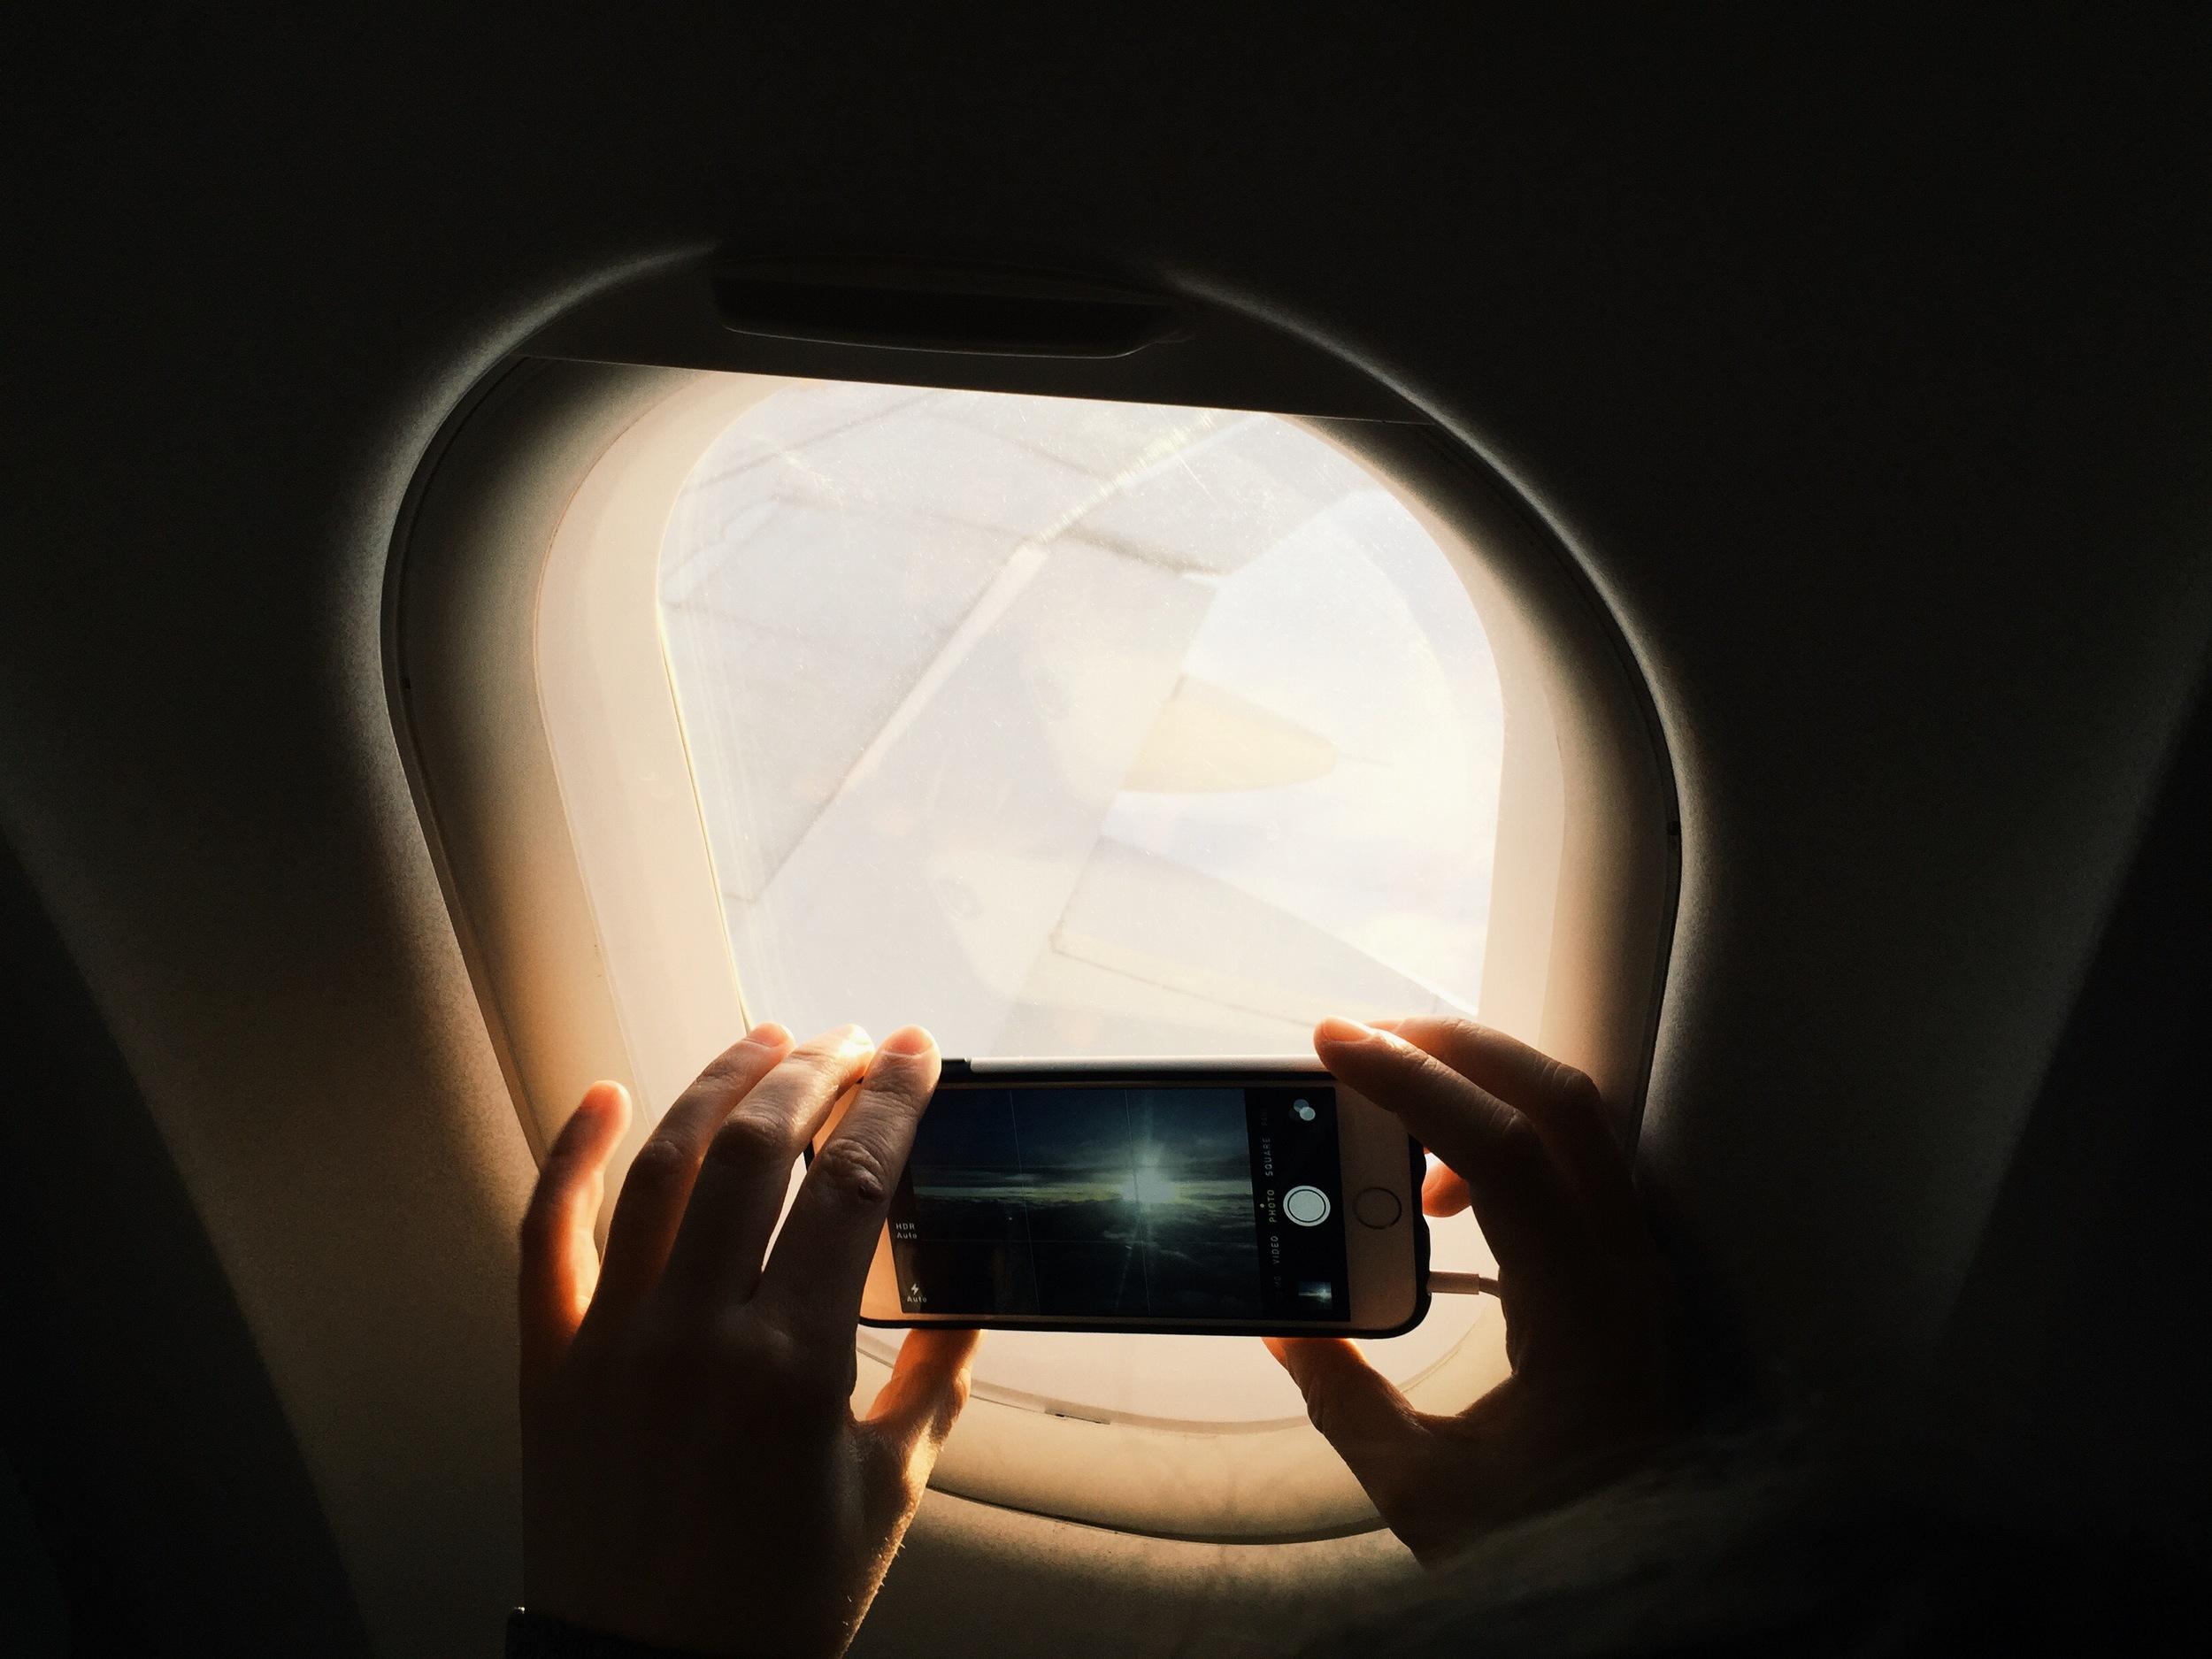 airplane-window-iphone-photo-hands